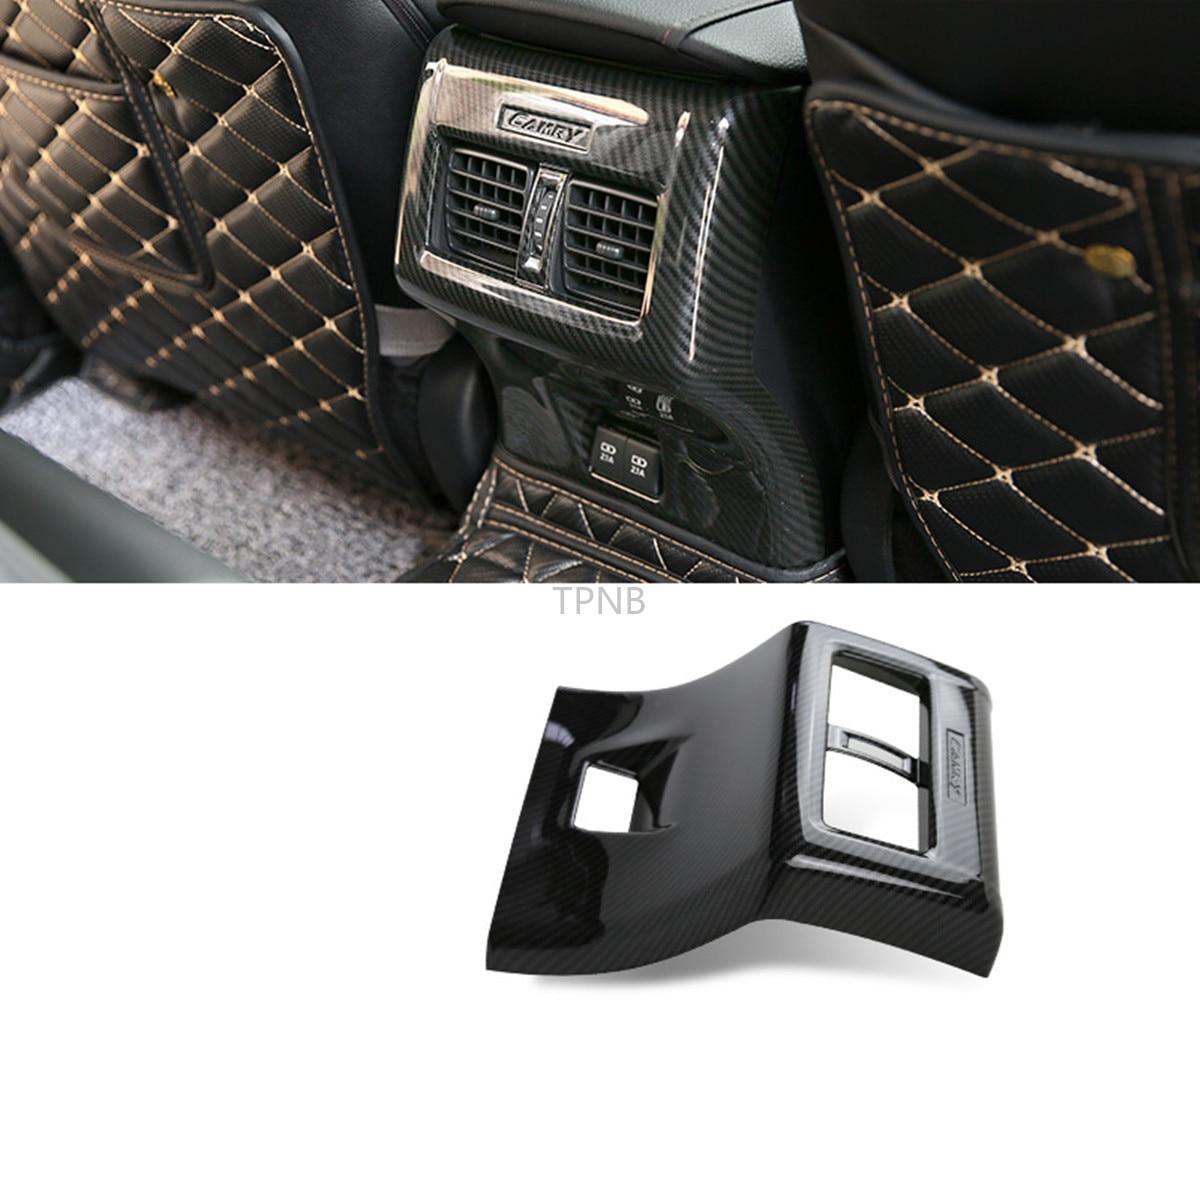 Fibra de carbono reposabrazos caja aire acondicionado trasero tapa de salida Trim para Toyota Camry 2018 2019 8th accesorios de estilo de coche